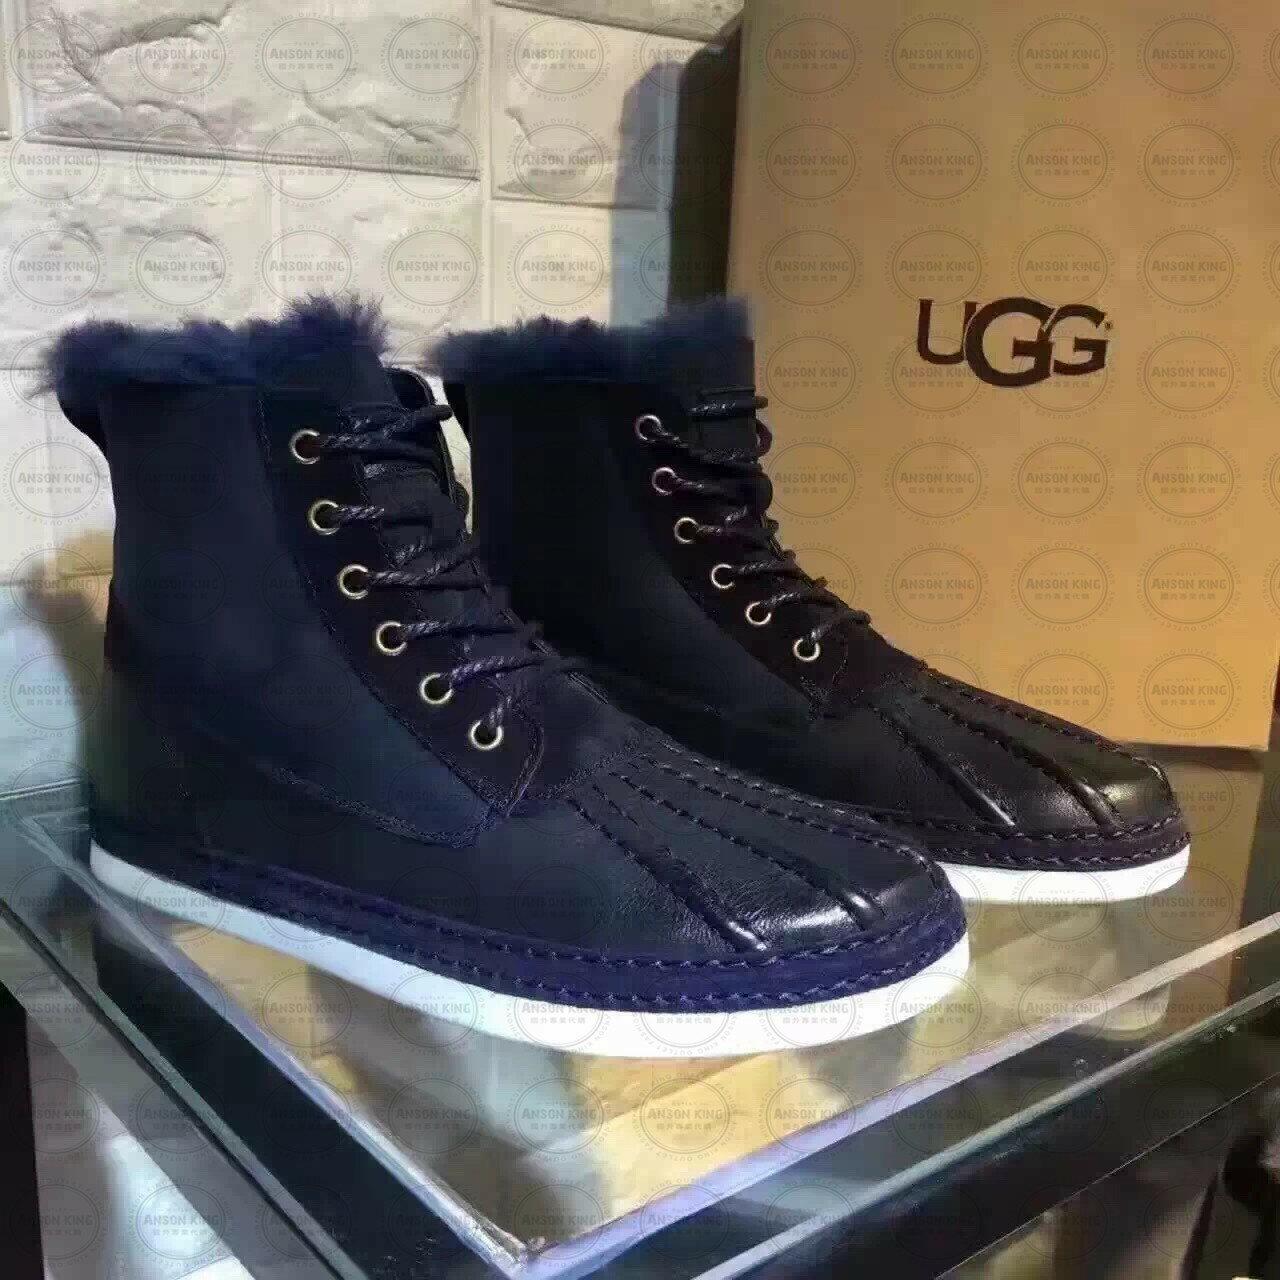 OUTLET正品代購 澳洲 UGG 冬季男款貝殼頭馬丁靴 短靴 保暖 真皮羊皮毛 雪靴 短靴 深藍 1